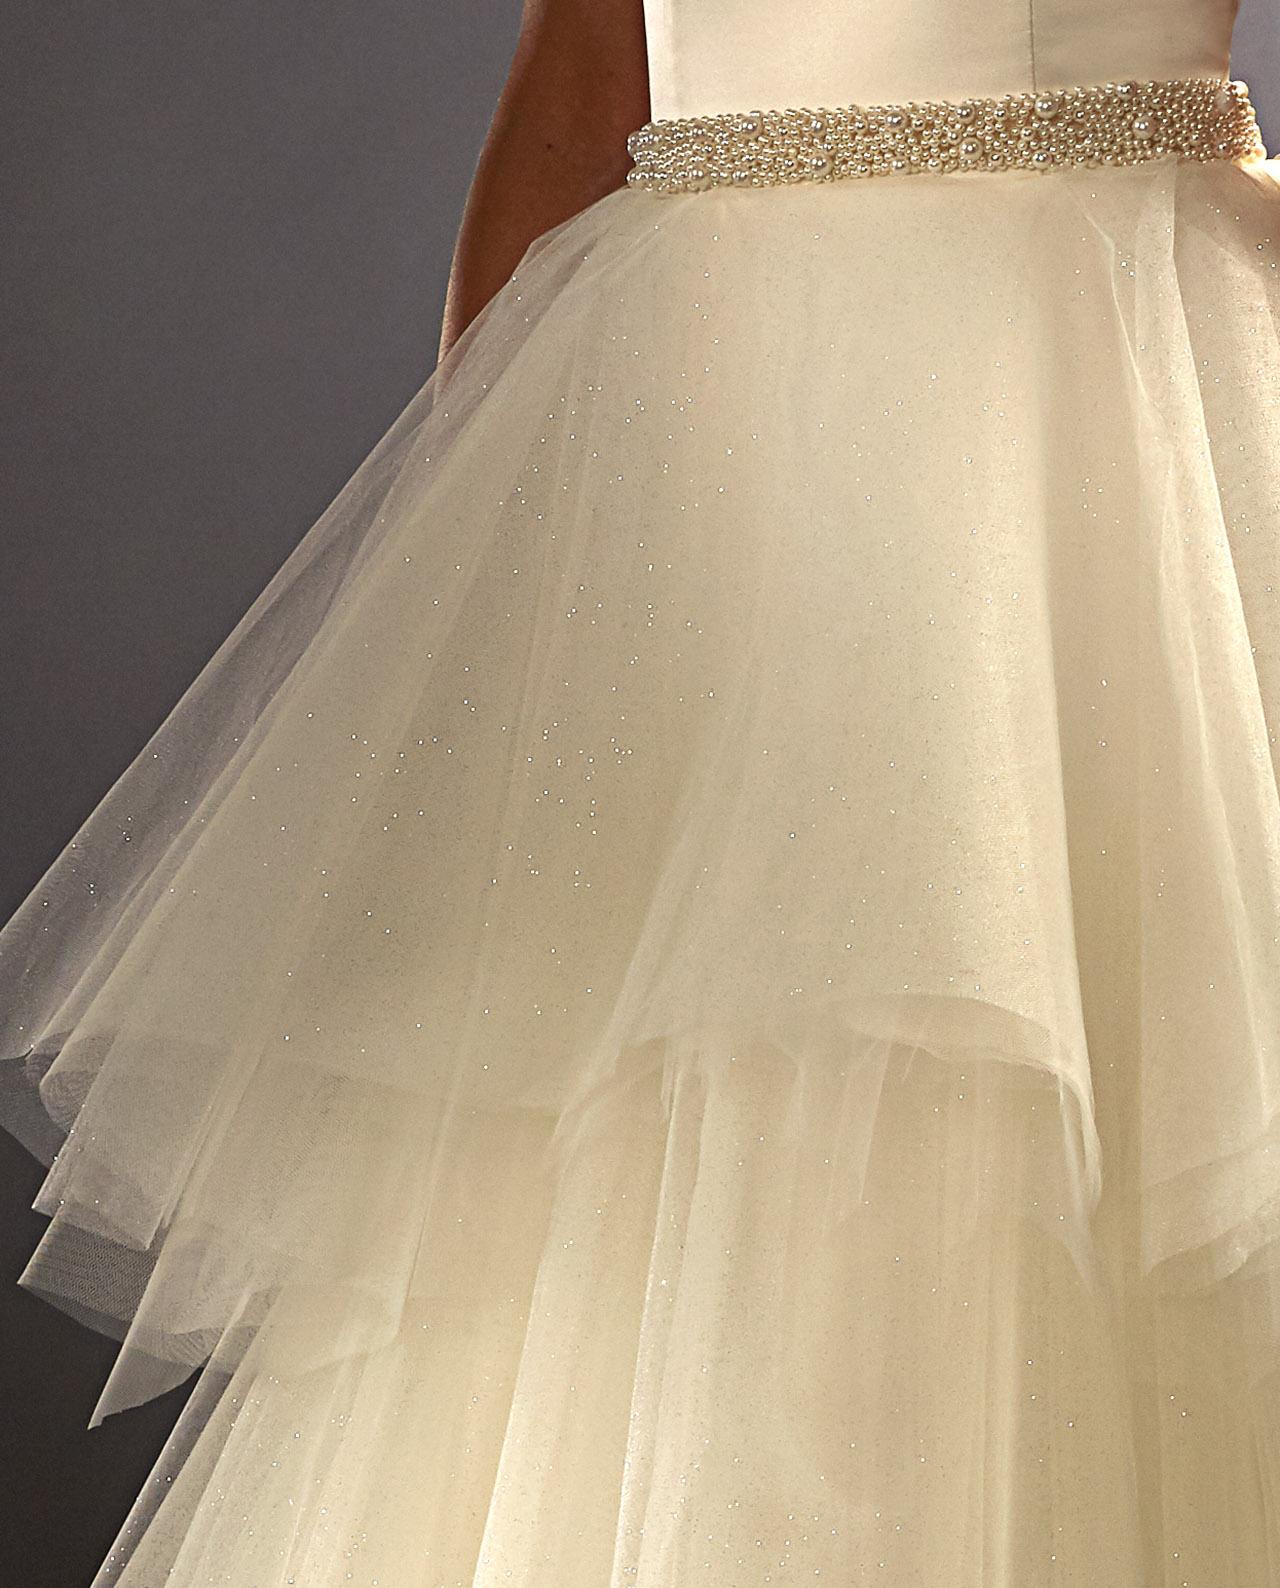 3abb8d896474 Scarlett Weddinggown med Bergman perle bælte. Perle Bælte. Bridal  accessories. Wedding. Brudetilbehør